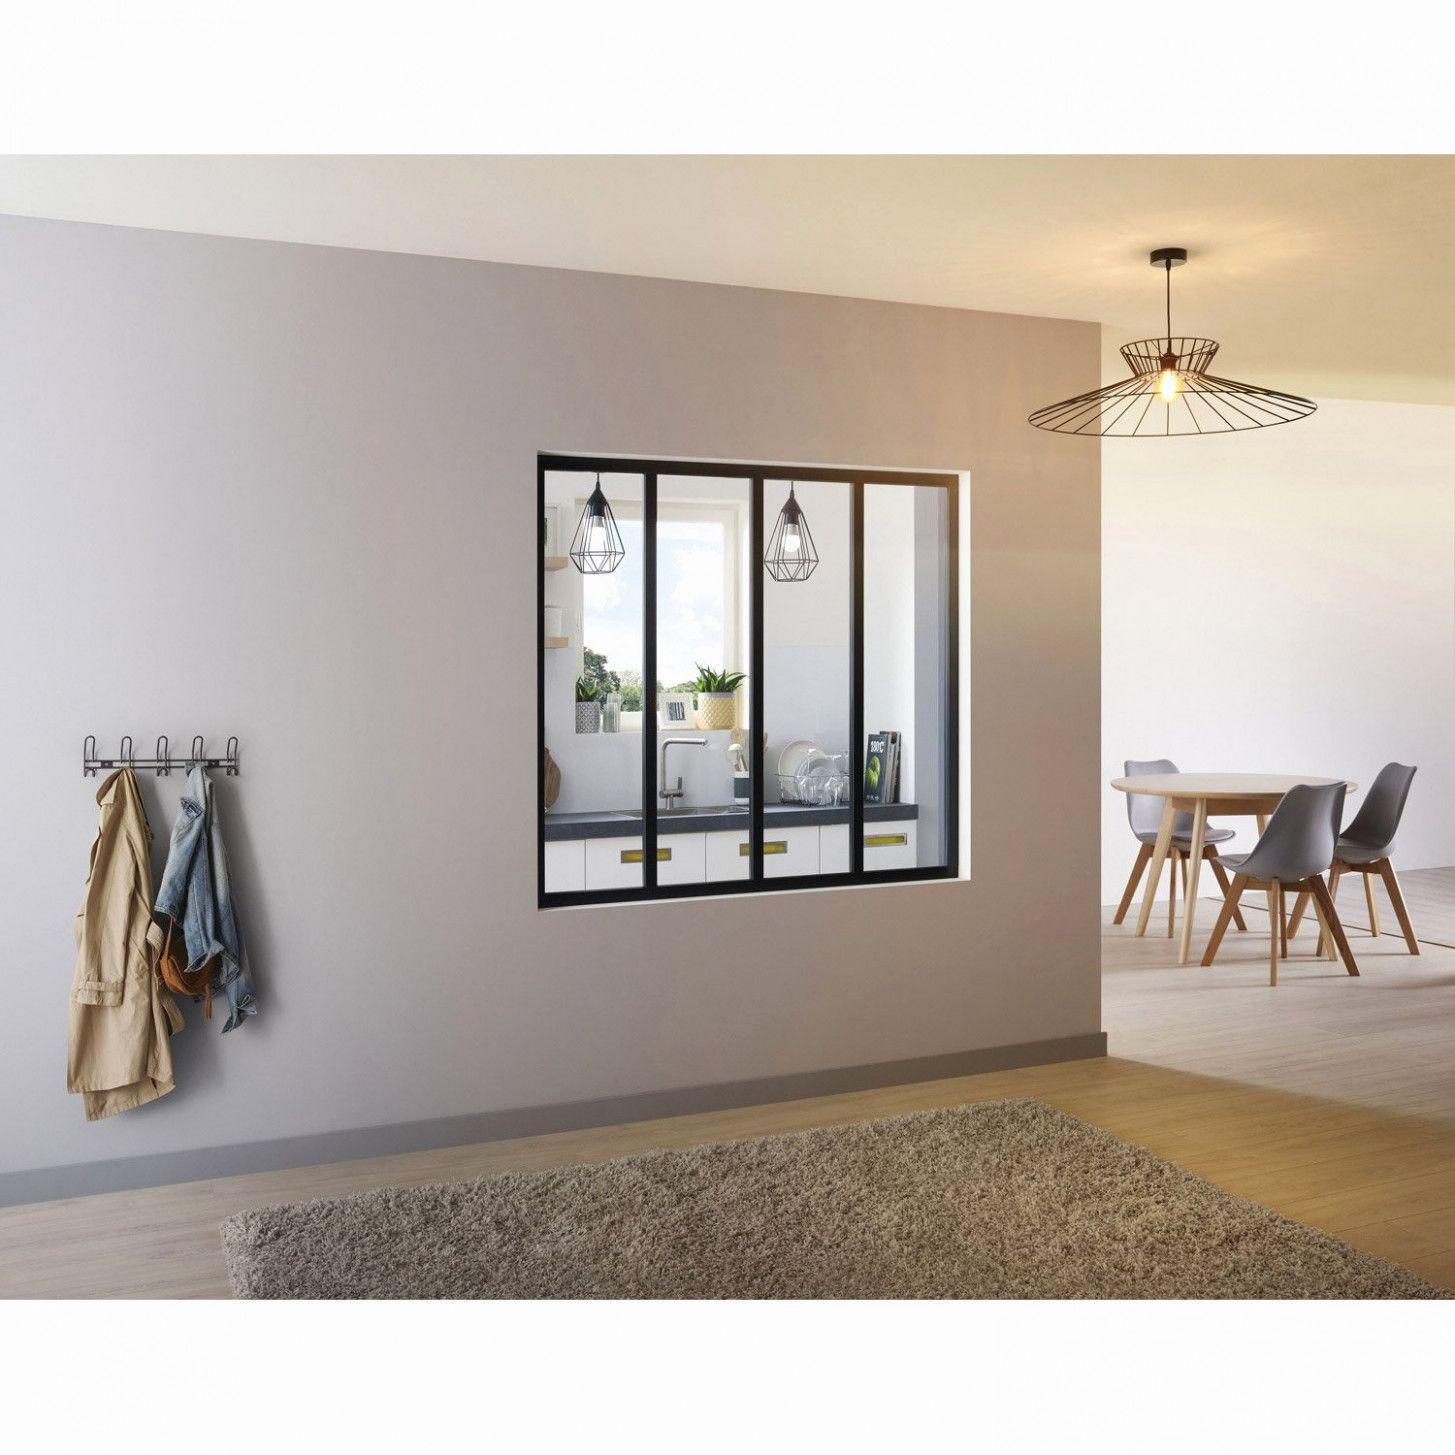 Verriere Orangerie Leroy Modern Bathroom Design Home Home Decor